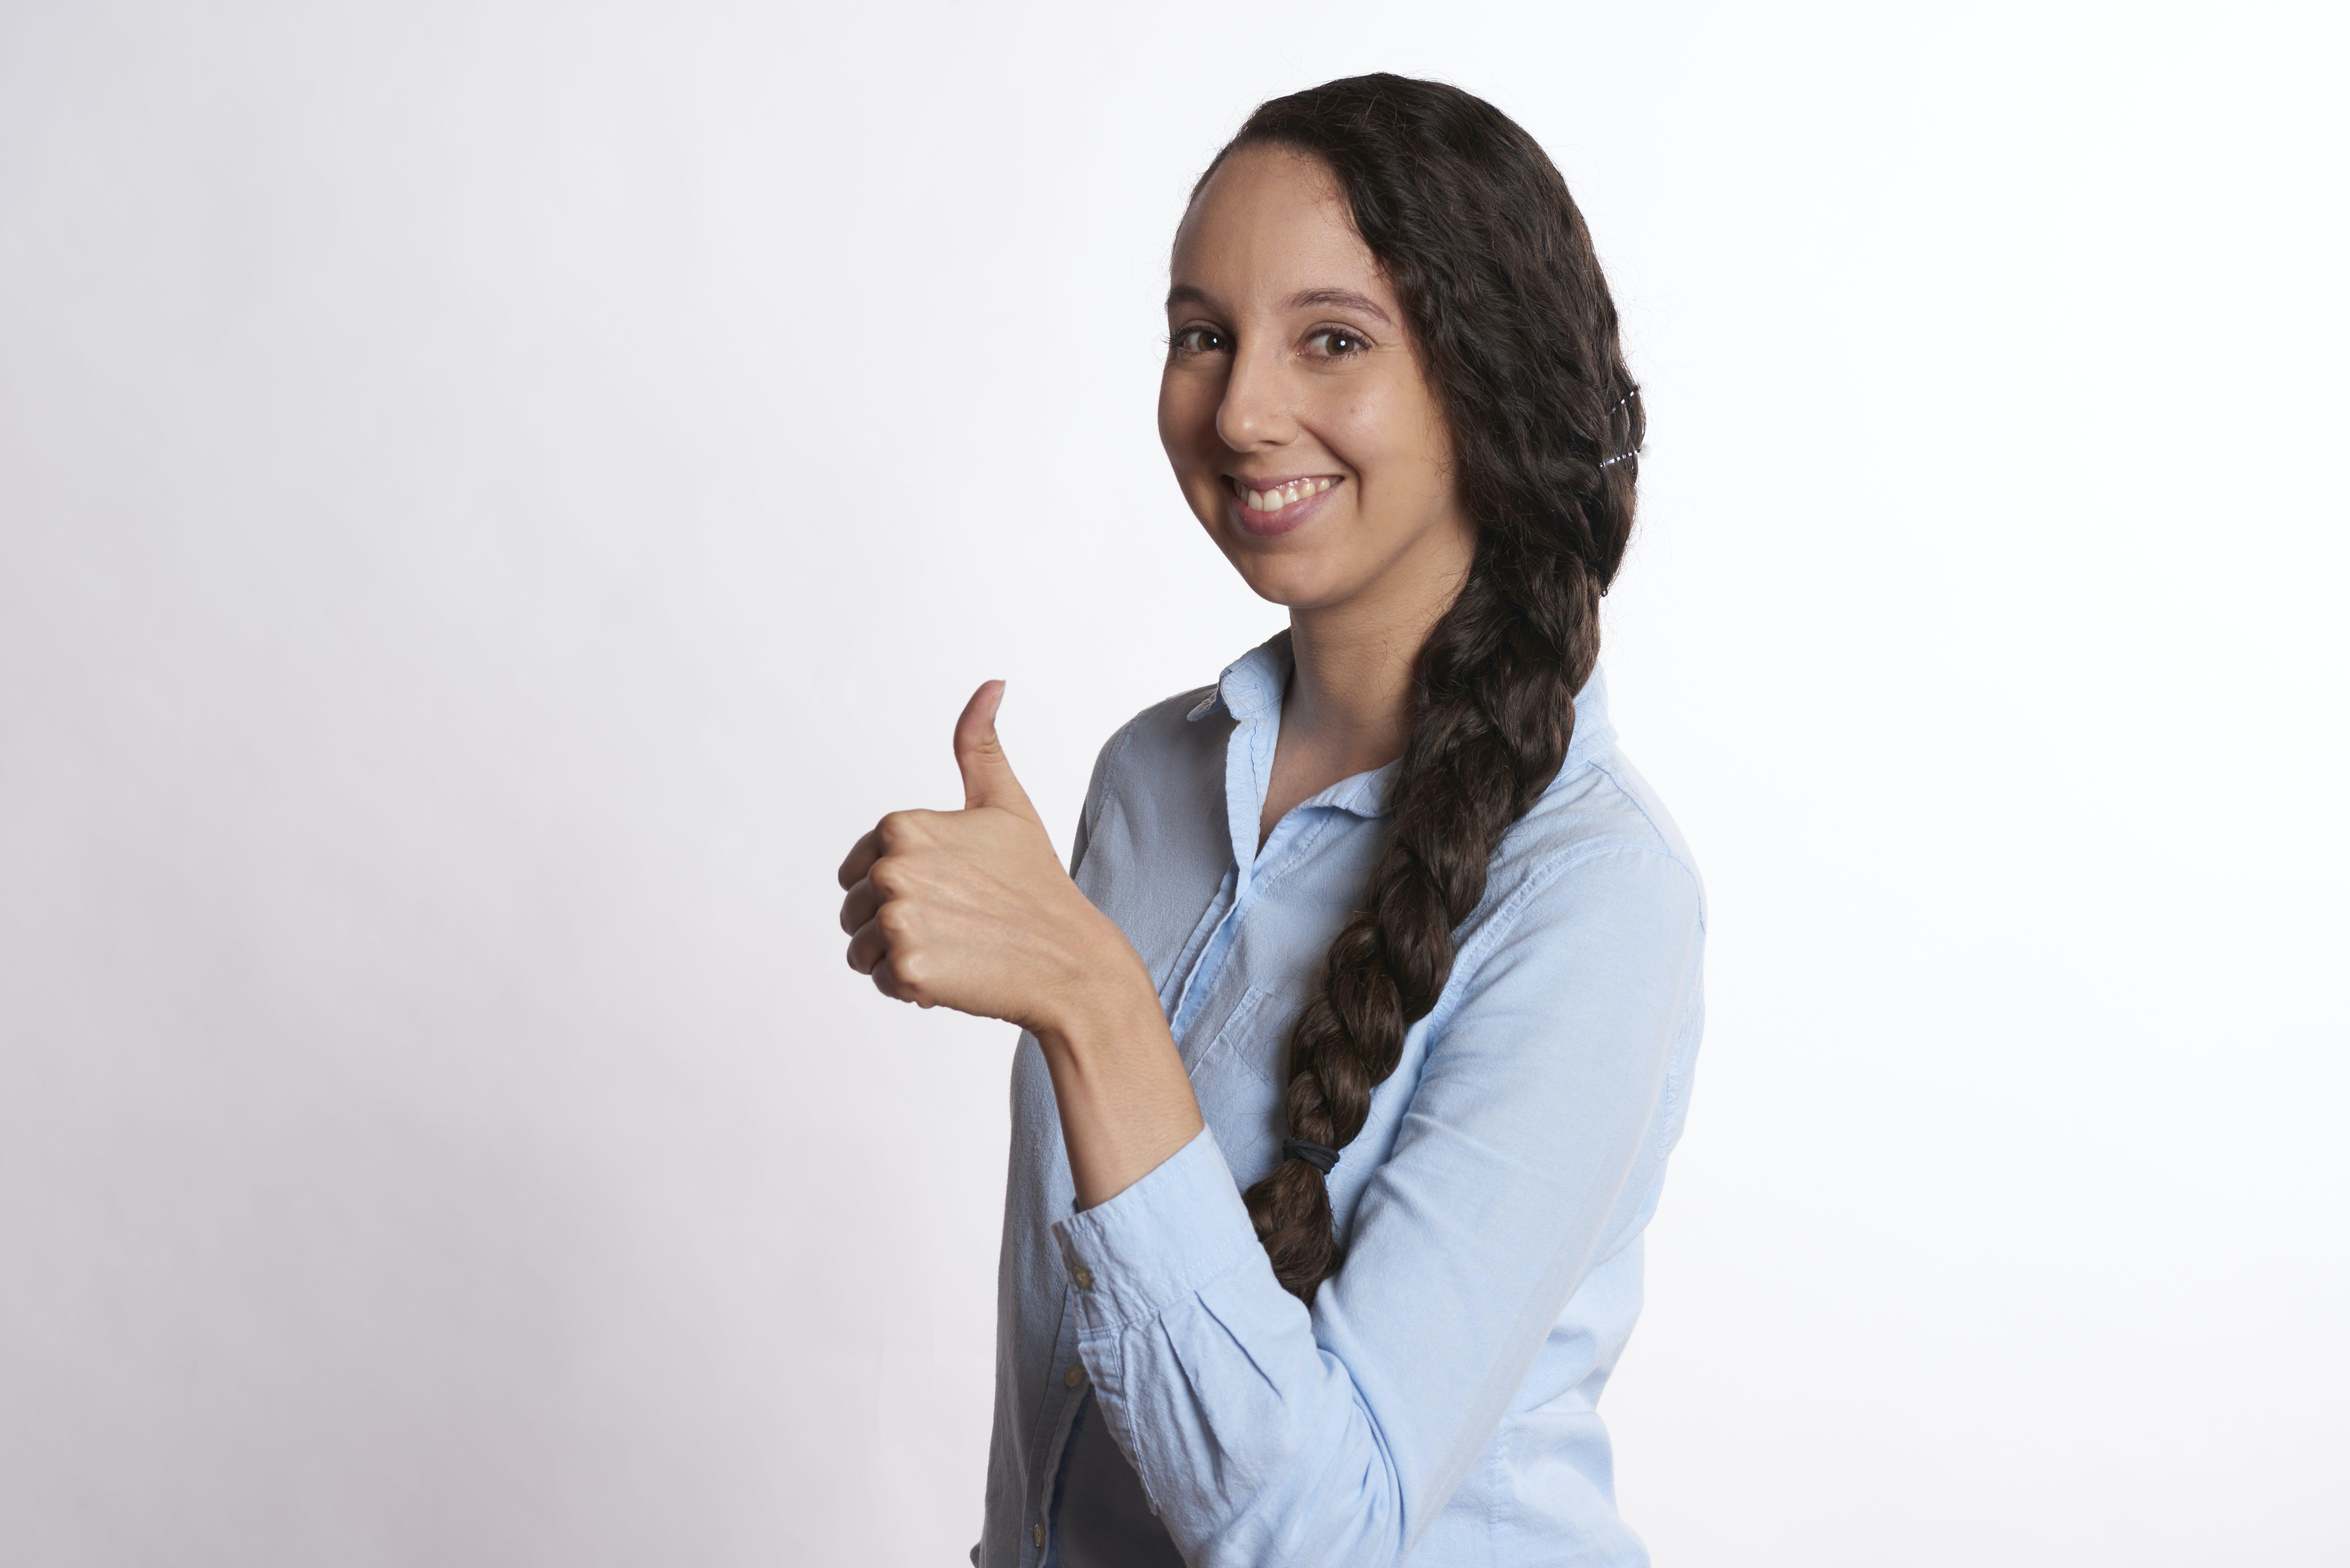 Girl Making Alright Gesture